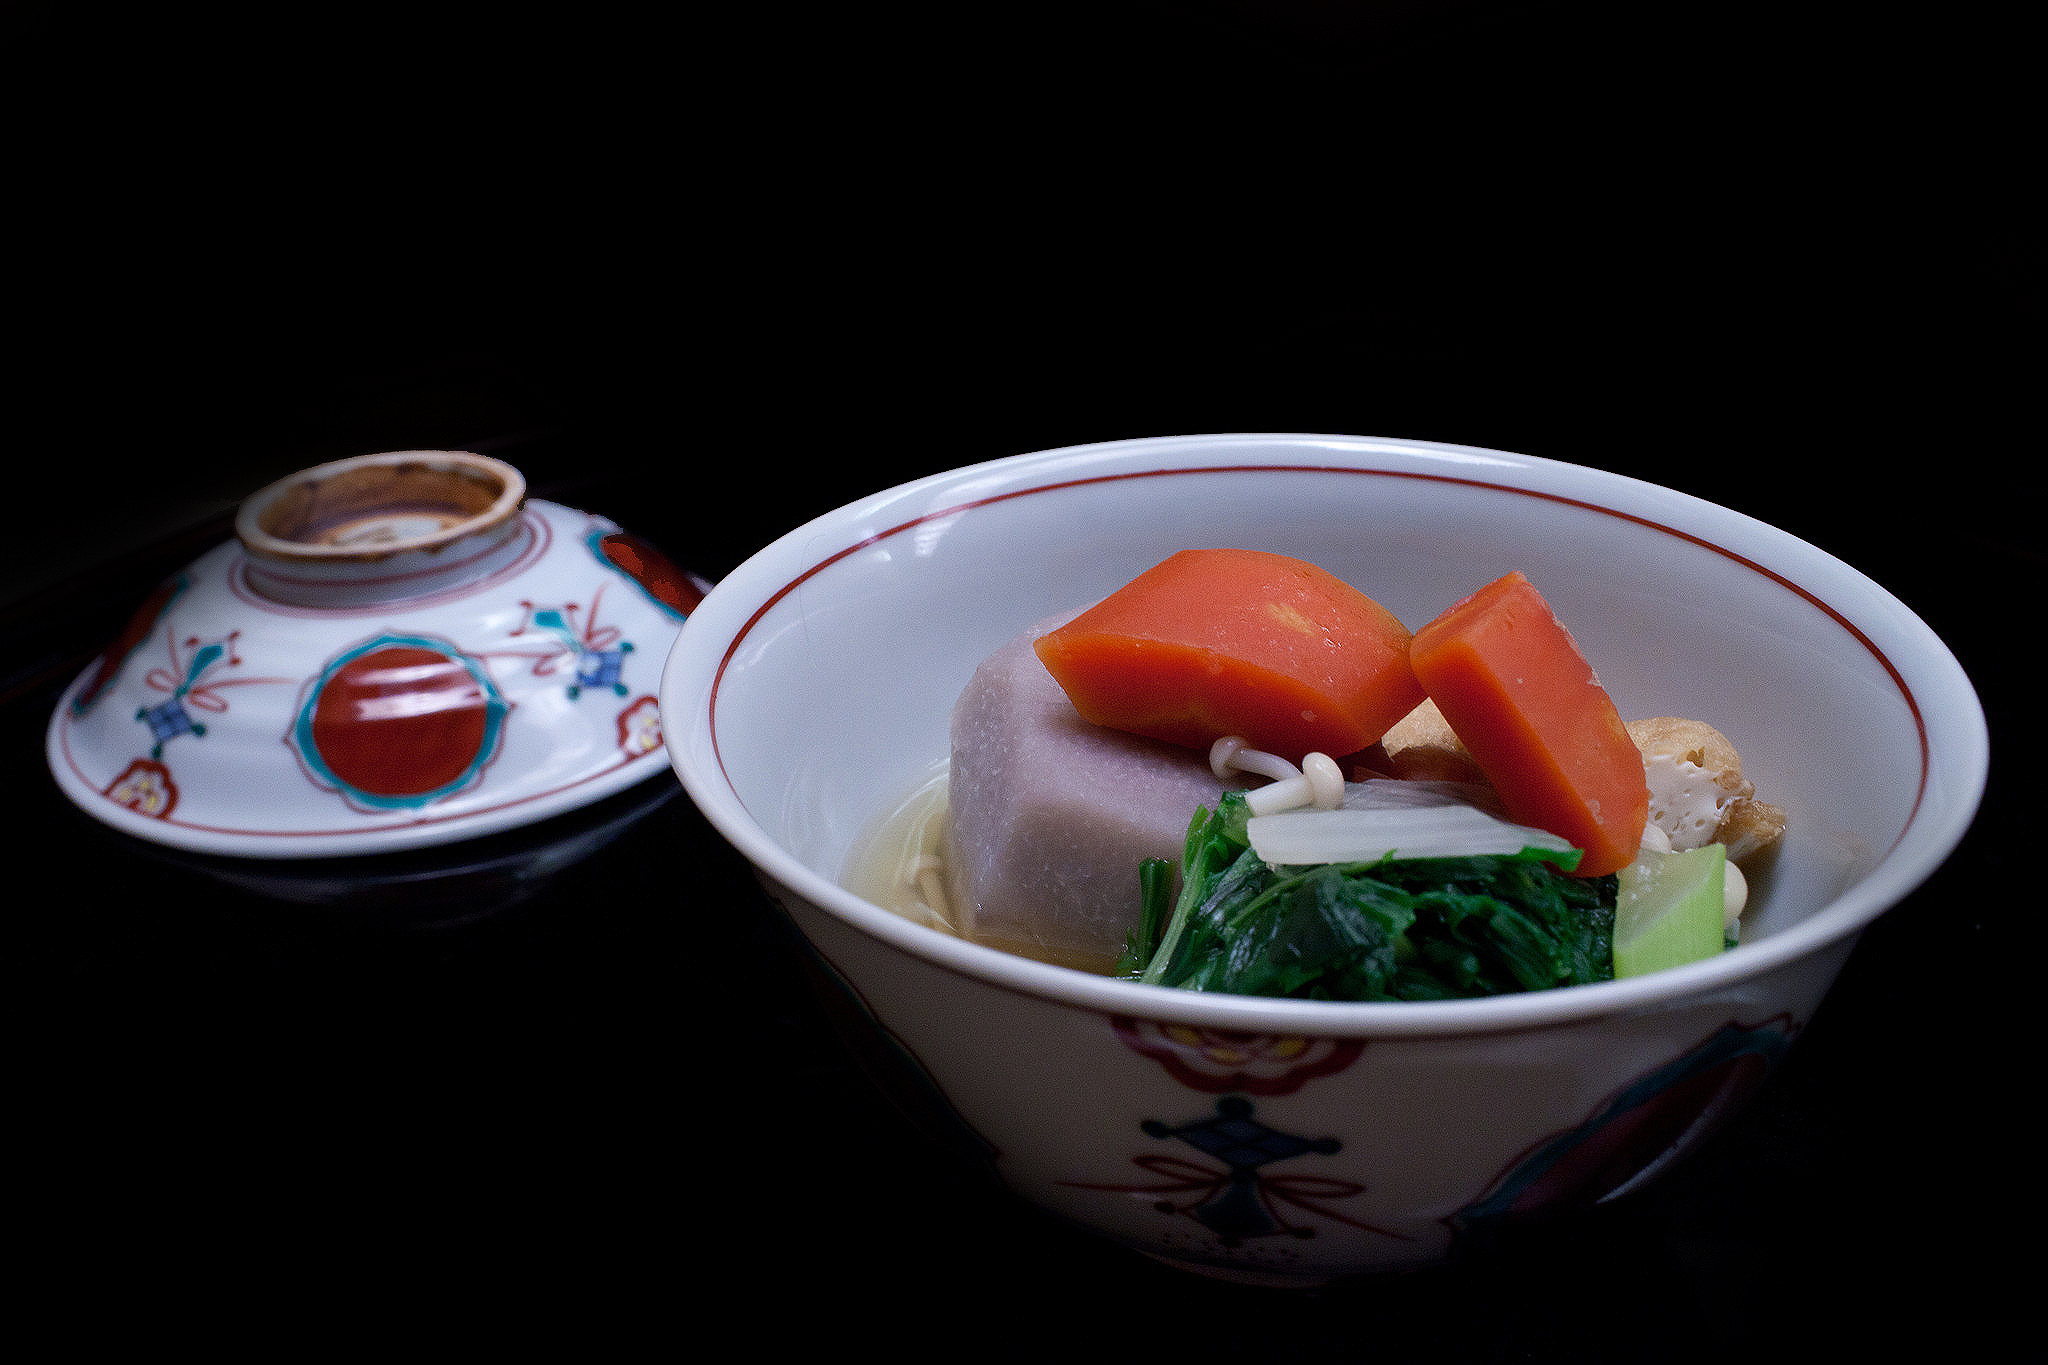 Chihana, Kyoto, Japan - Simmered taro root with Kyoto carrot